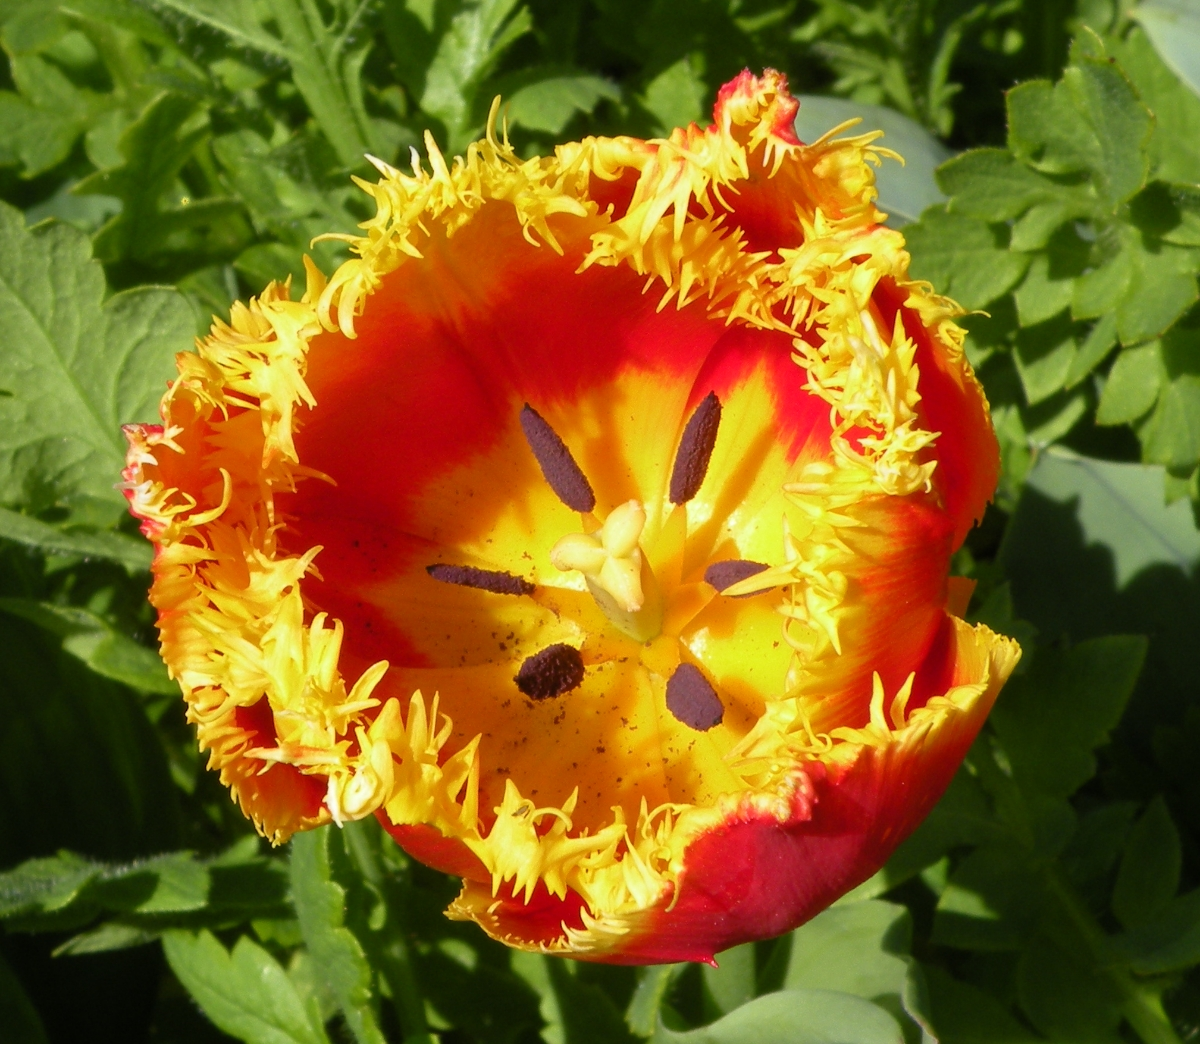 Aufgeblühte gelb-rote Tulpe